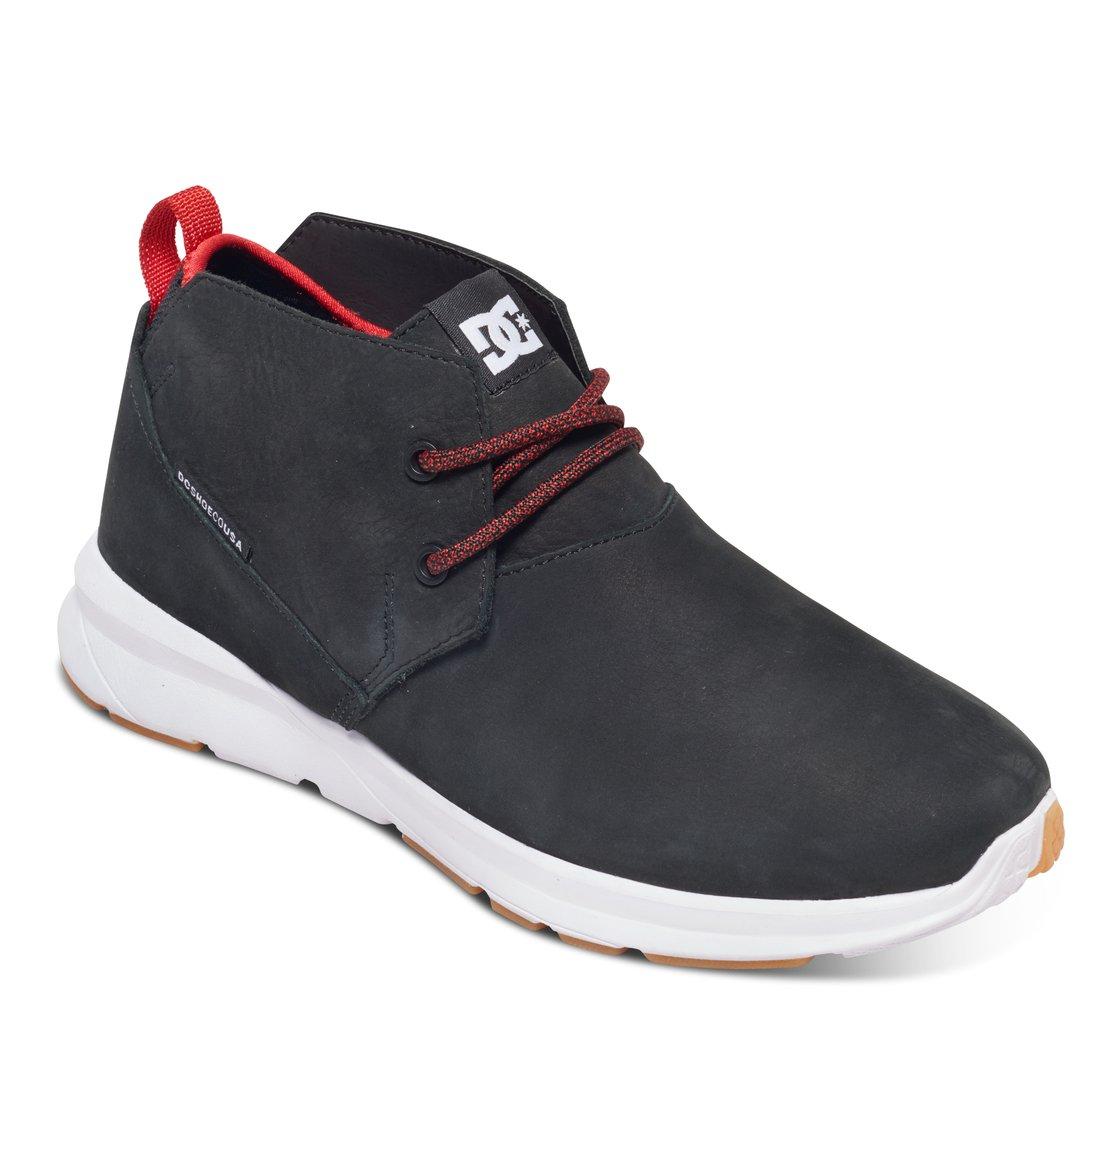 Dc Bota Ashlar Zapato Media Shoes Le Adys100367 Hombres qp4zYwx